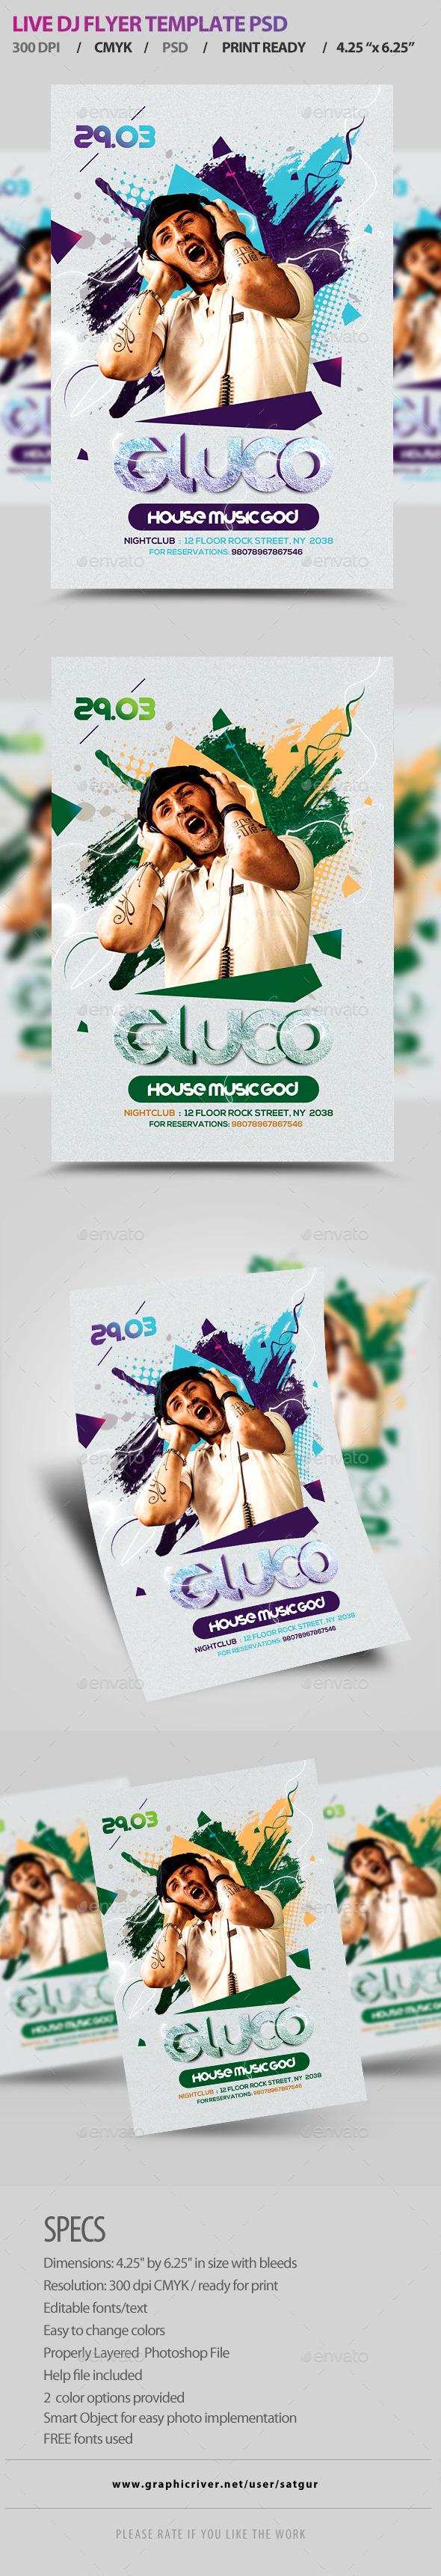 GraphicRiver Guest DJ Flyer Template PSD V8 8866002